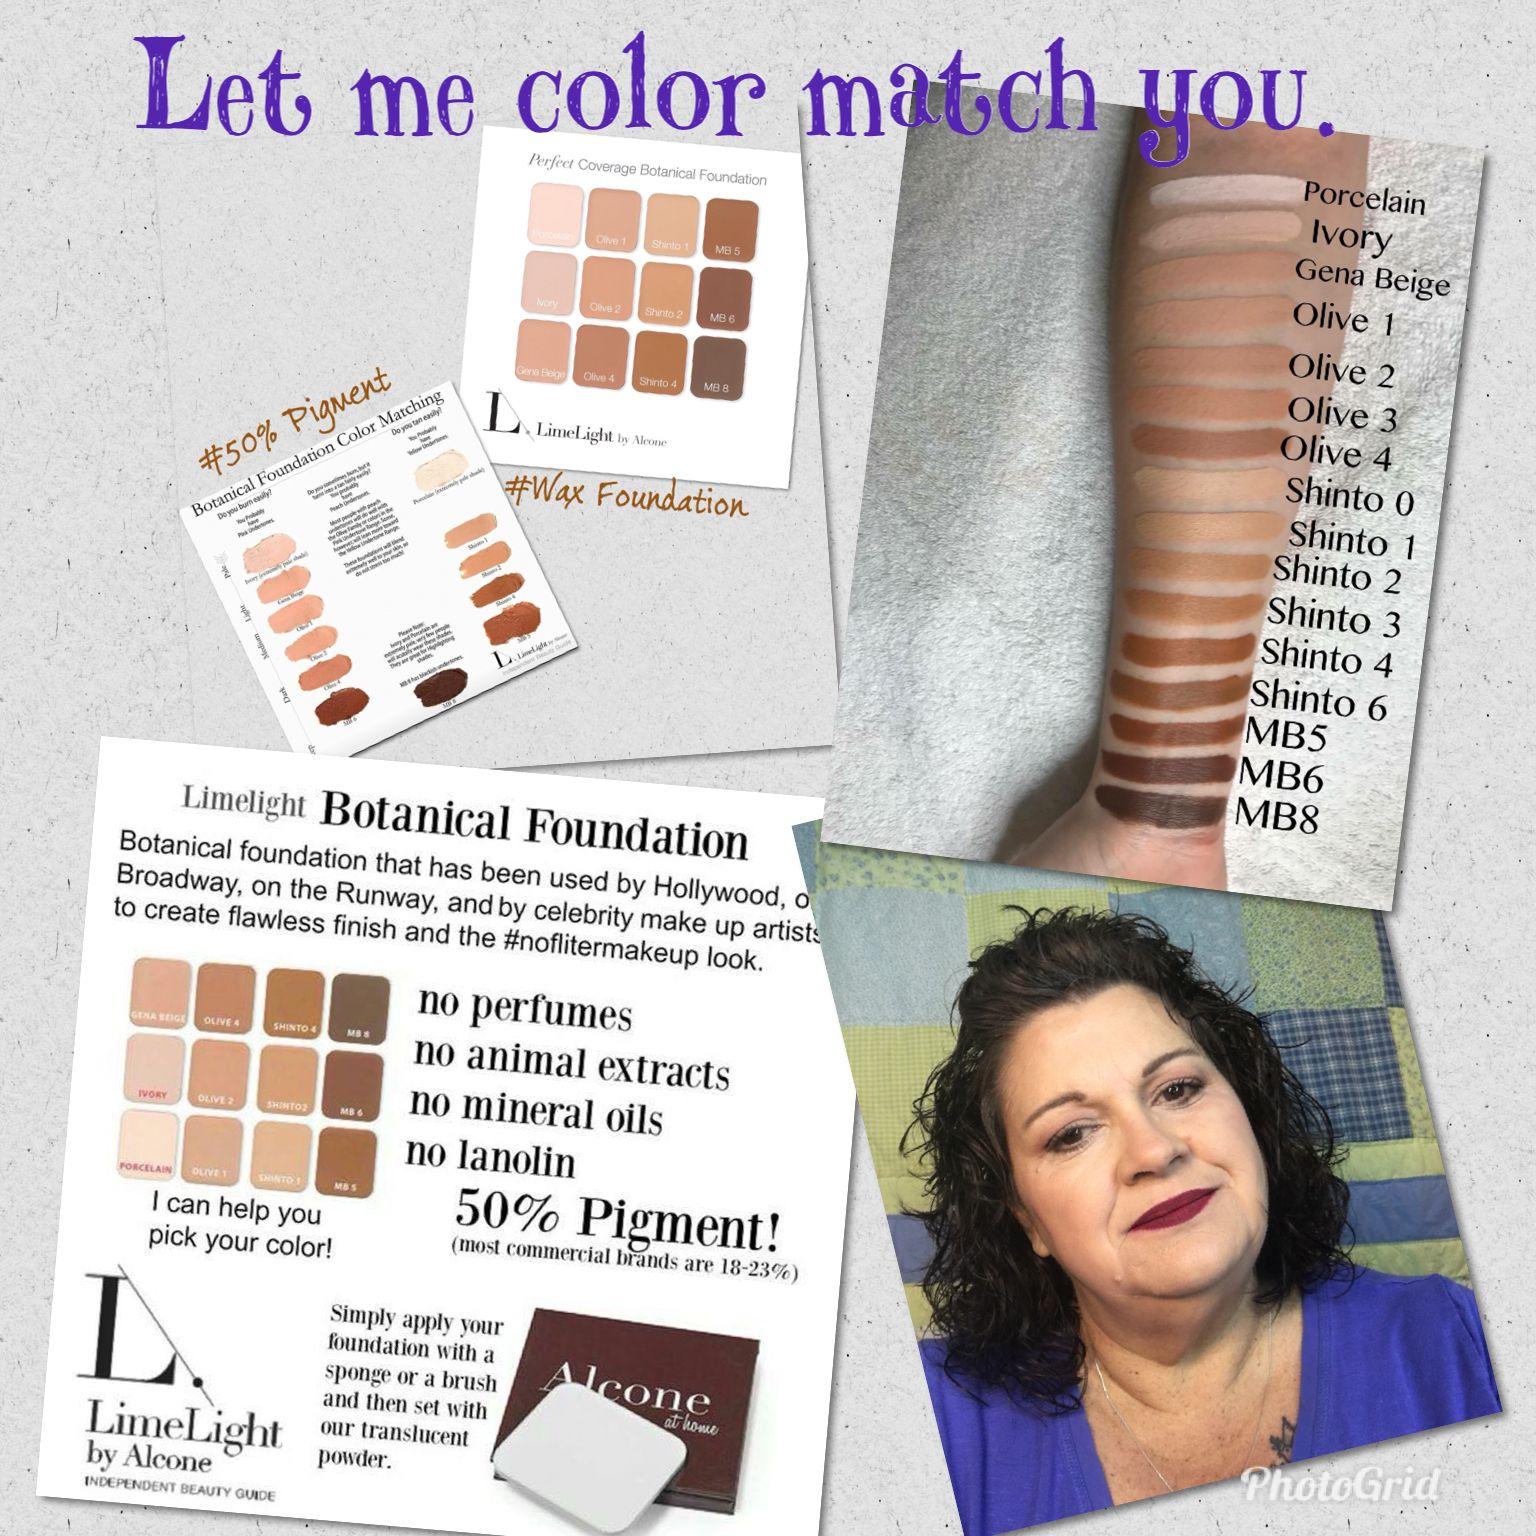 Color match your foundation Limelife Botanical